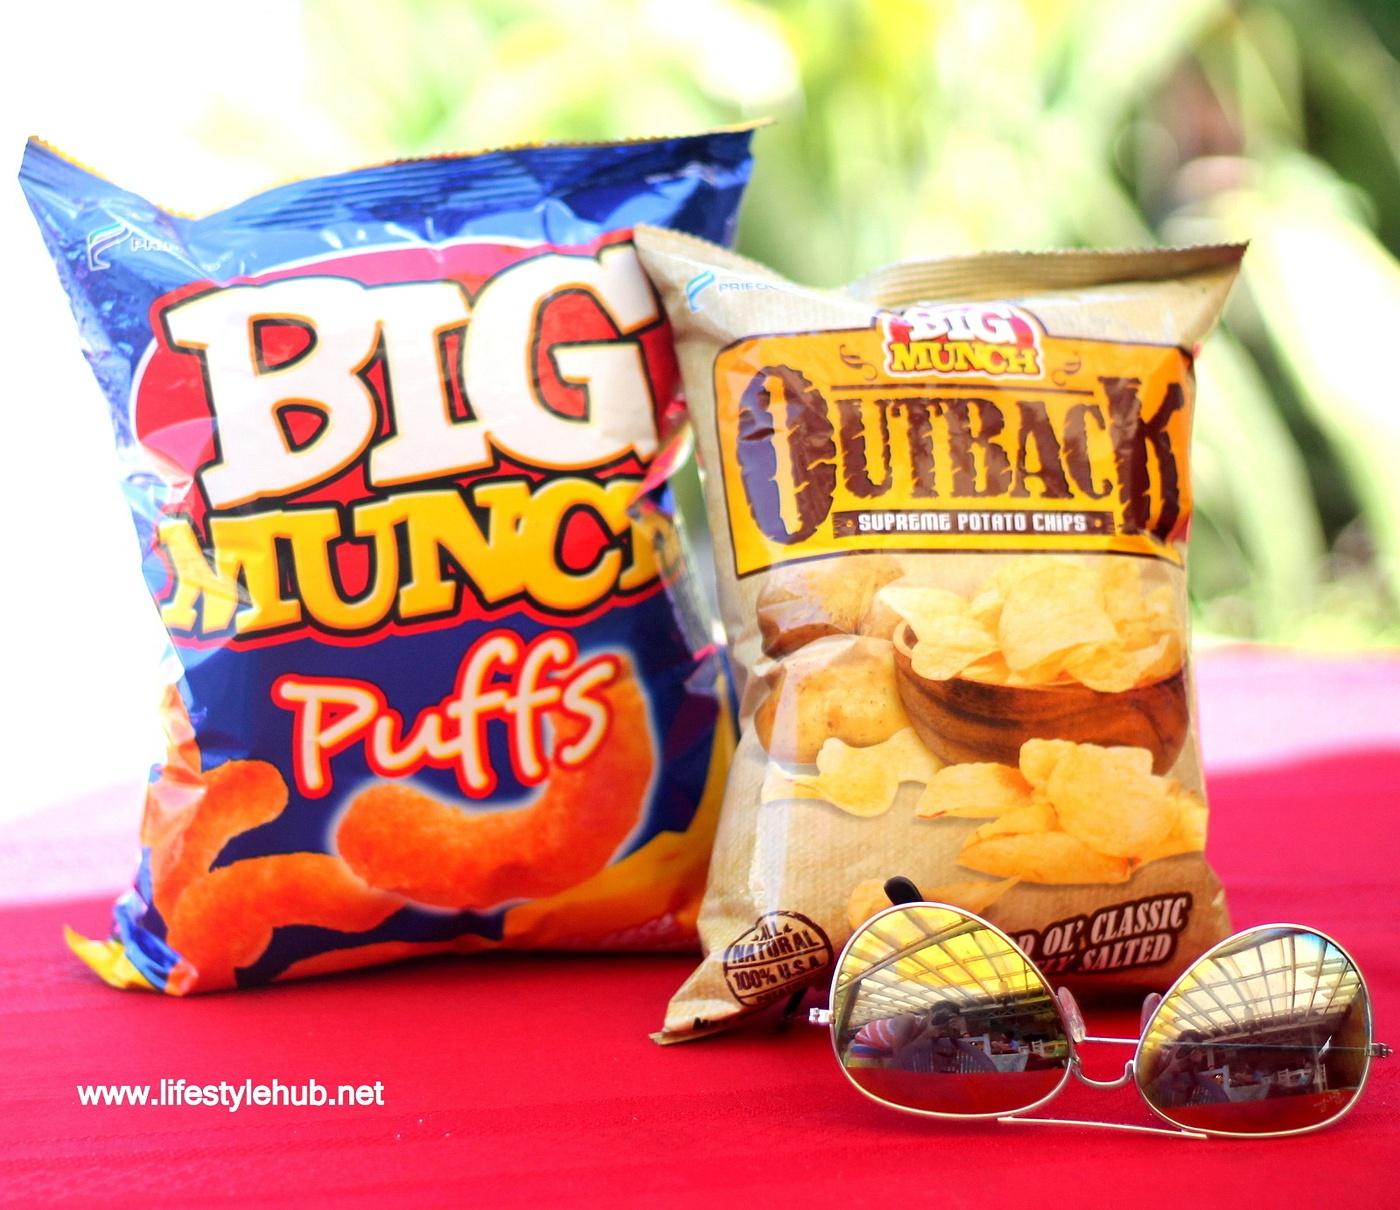 prifood junkfood outback potato ridges